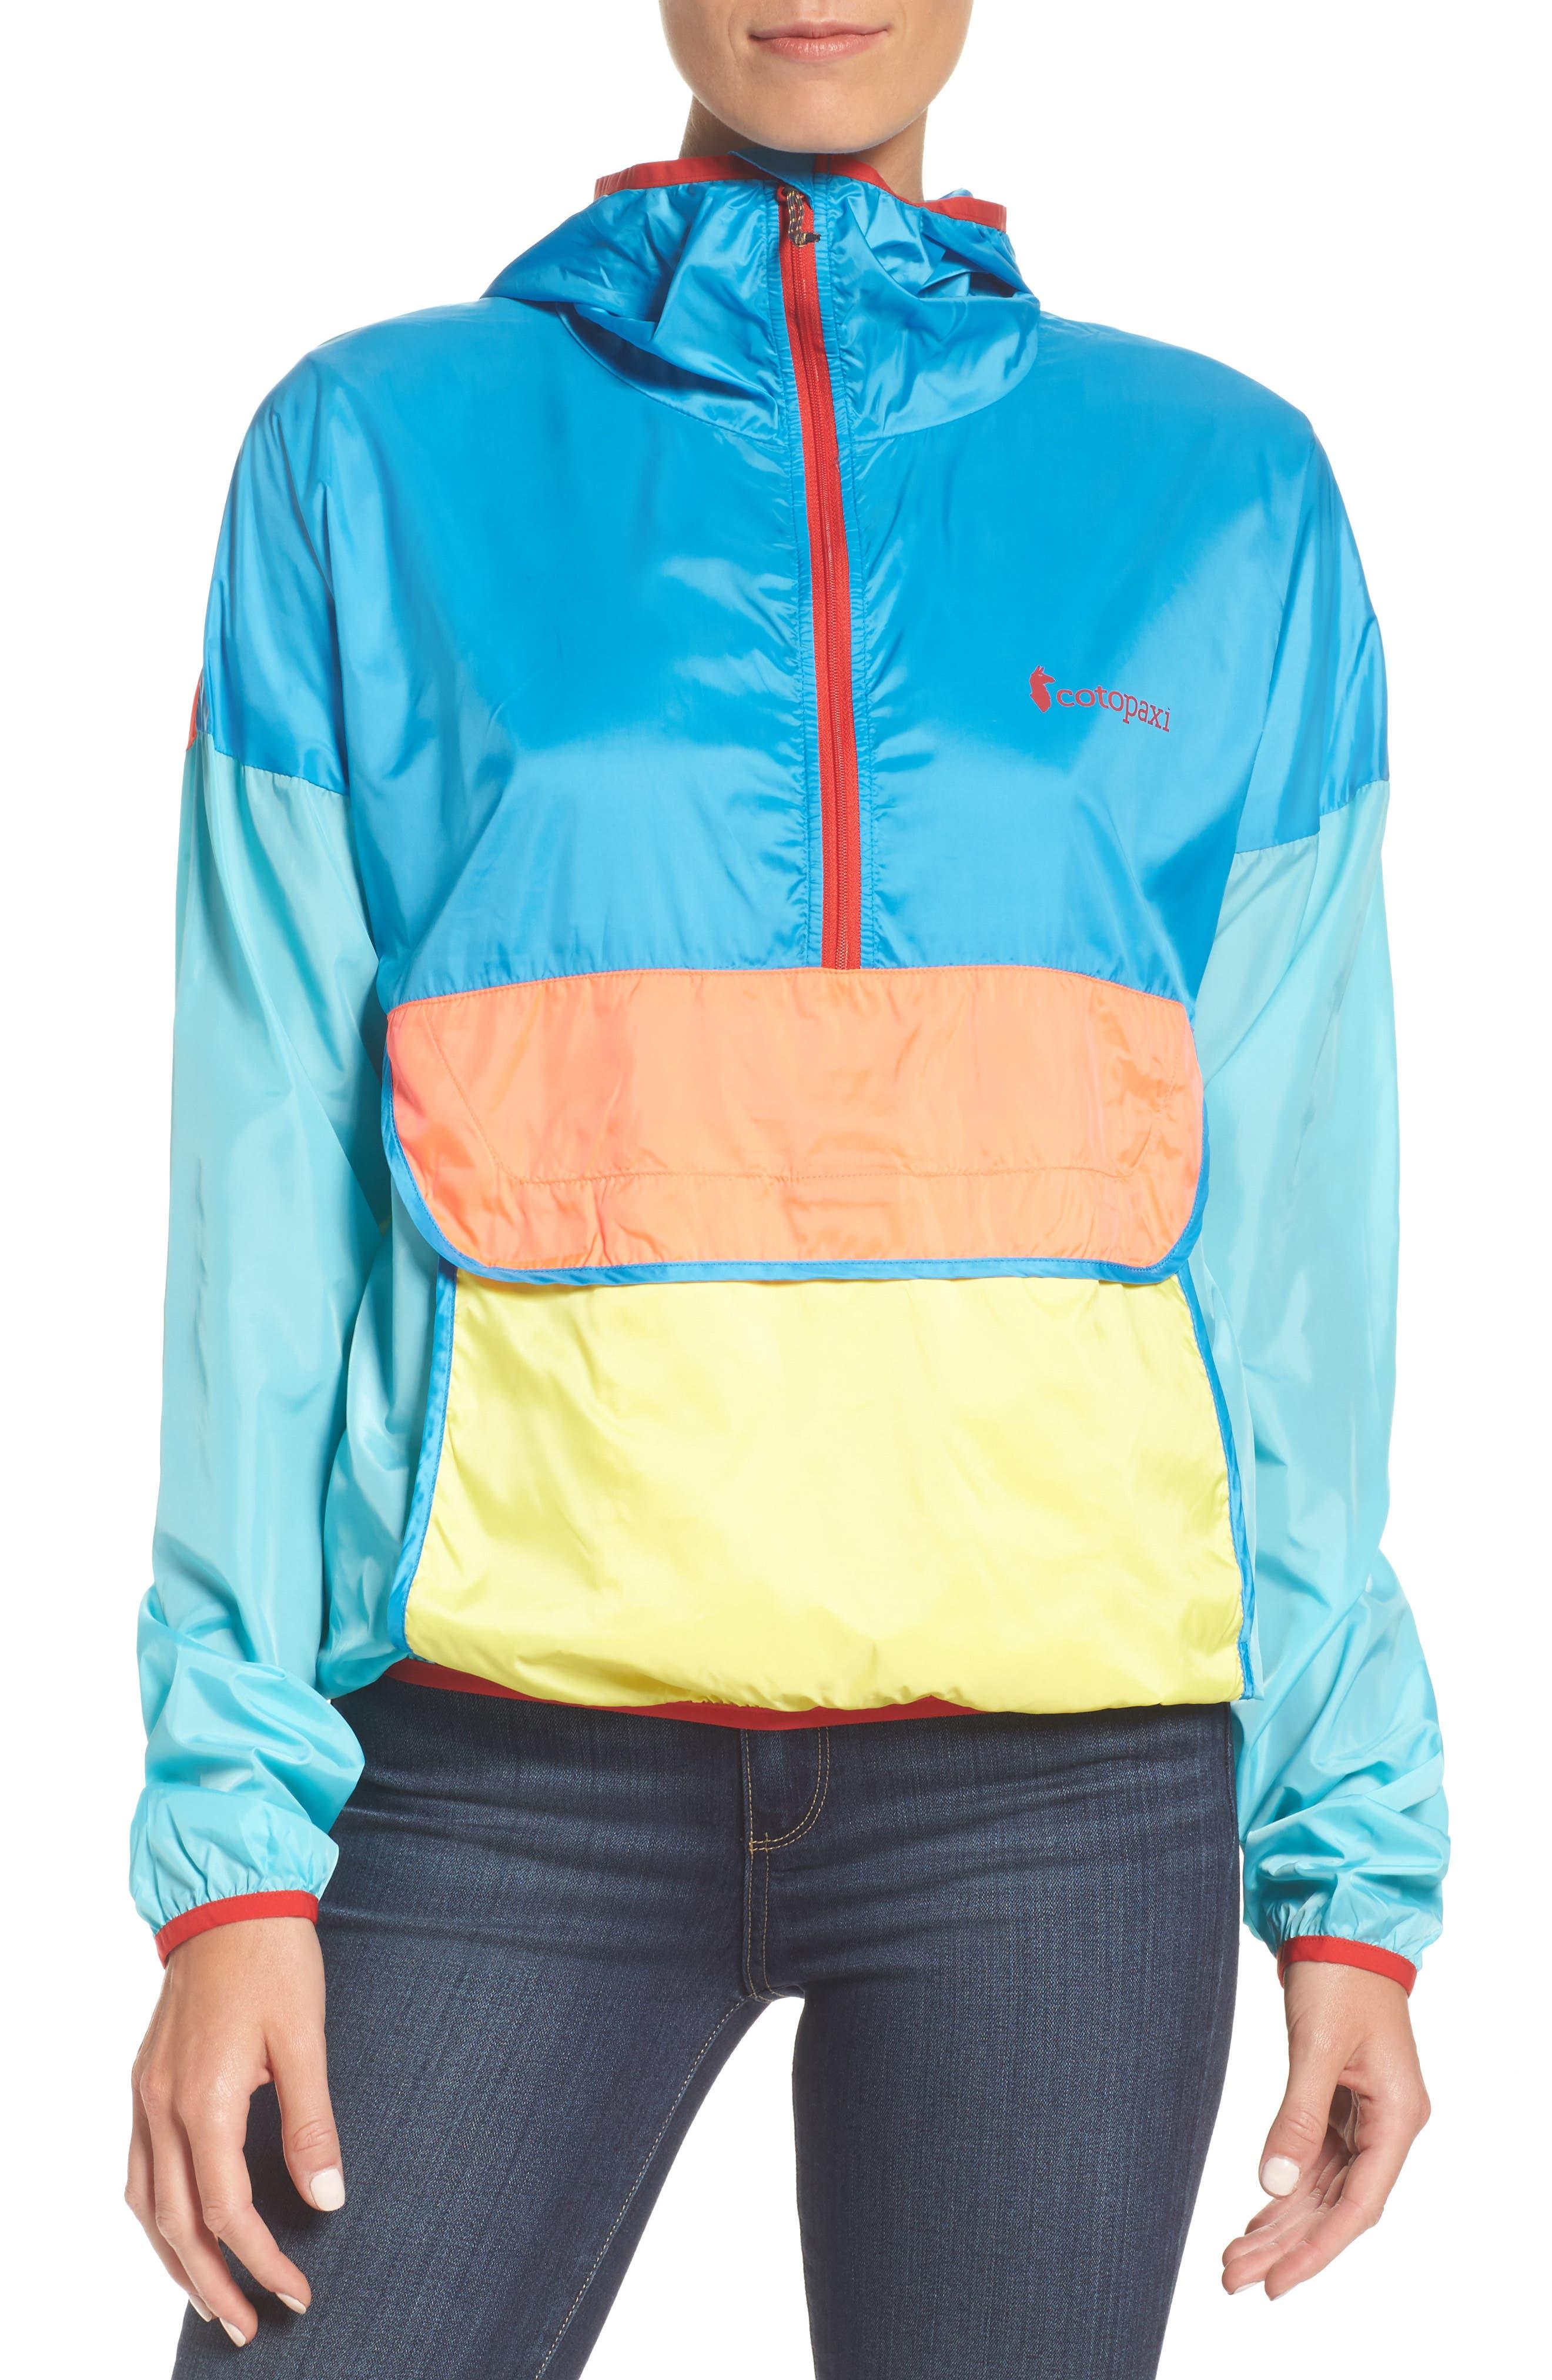 Main Image - Cotopaxi Teca Packable Water Resistant Windbreaker Jacket